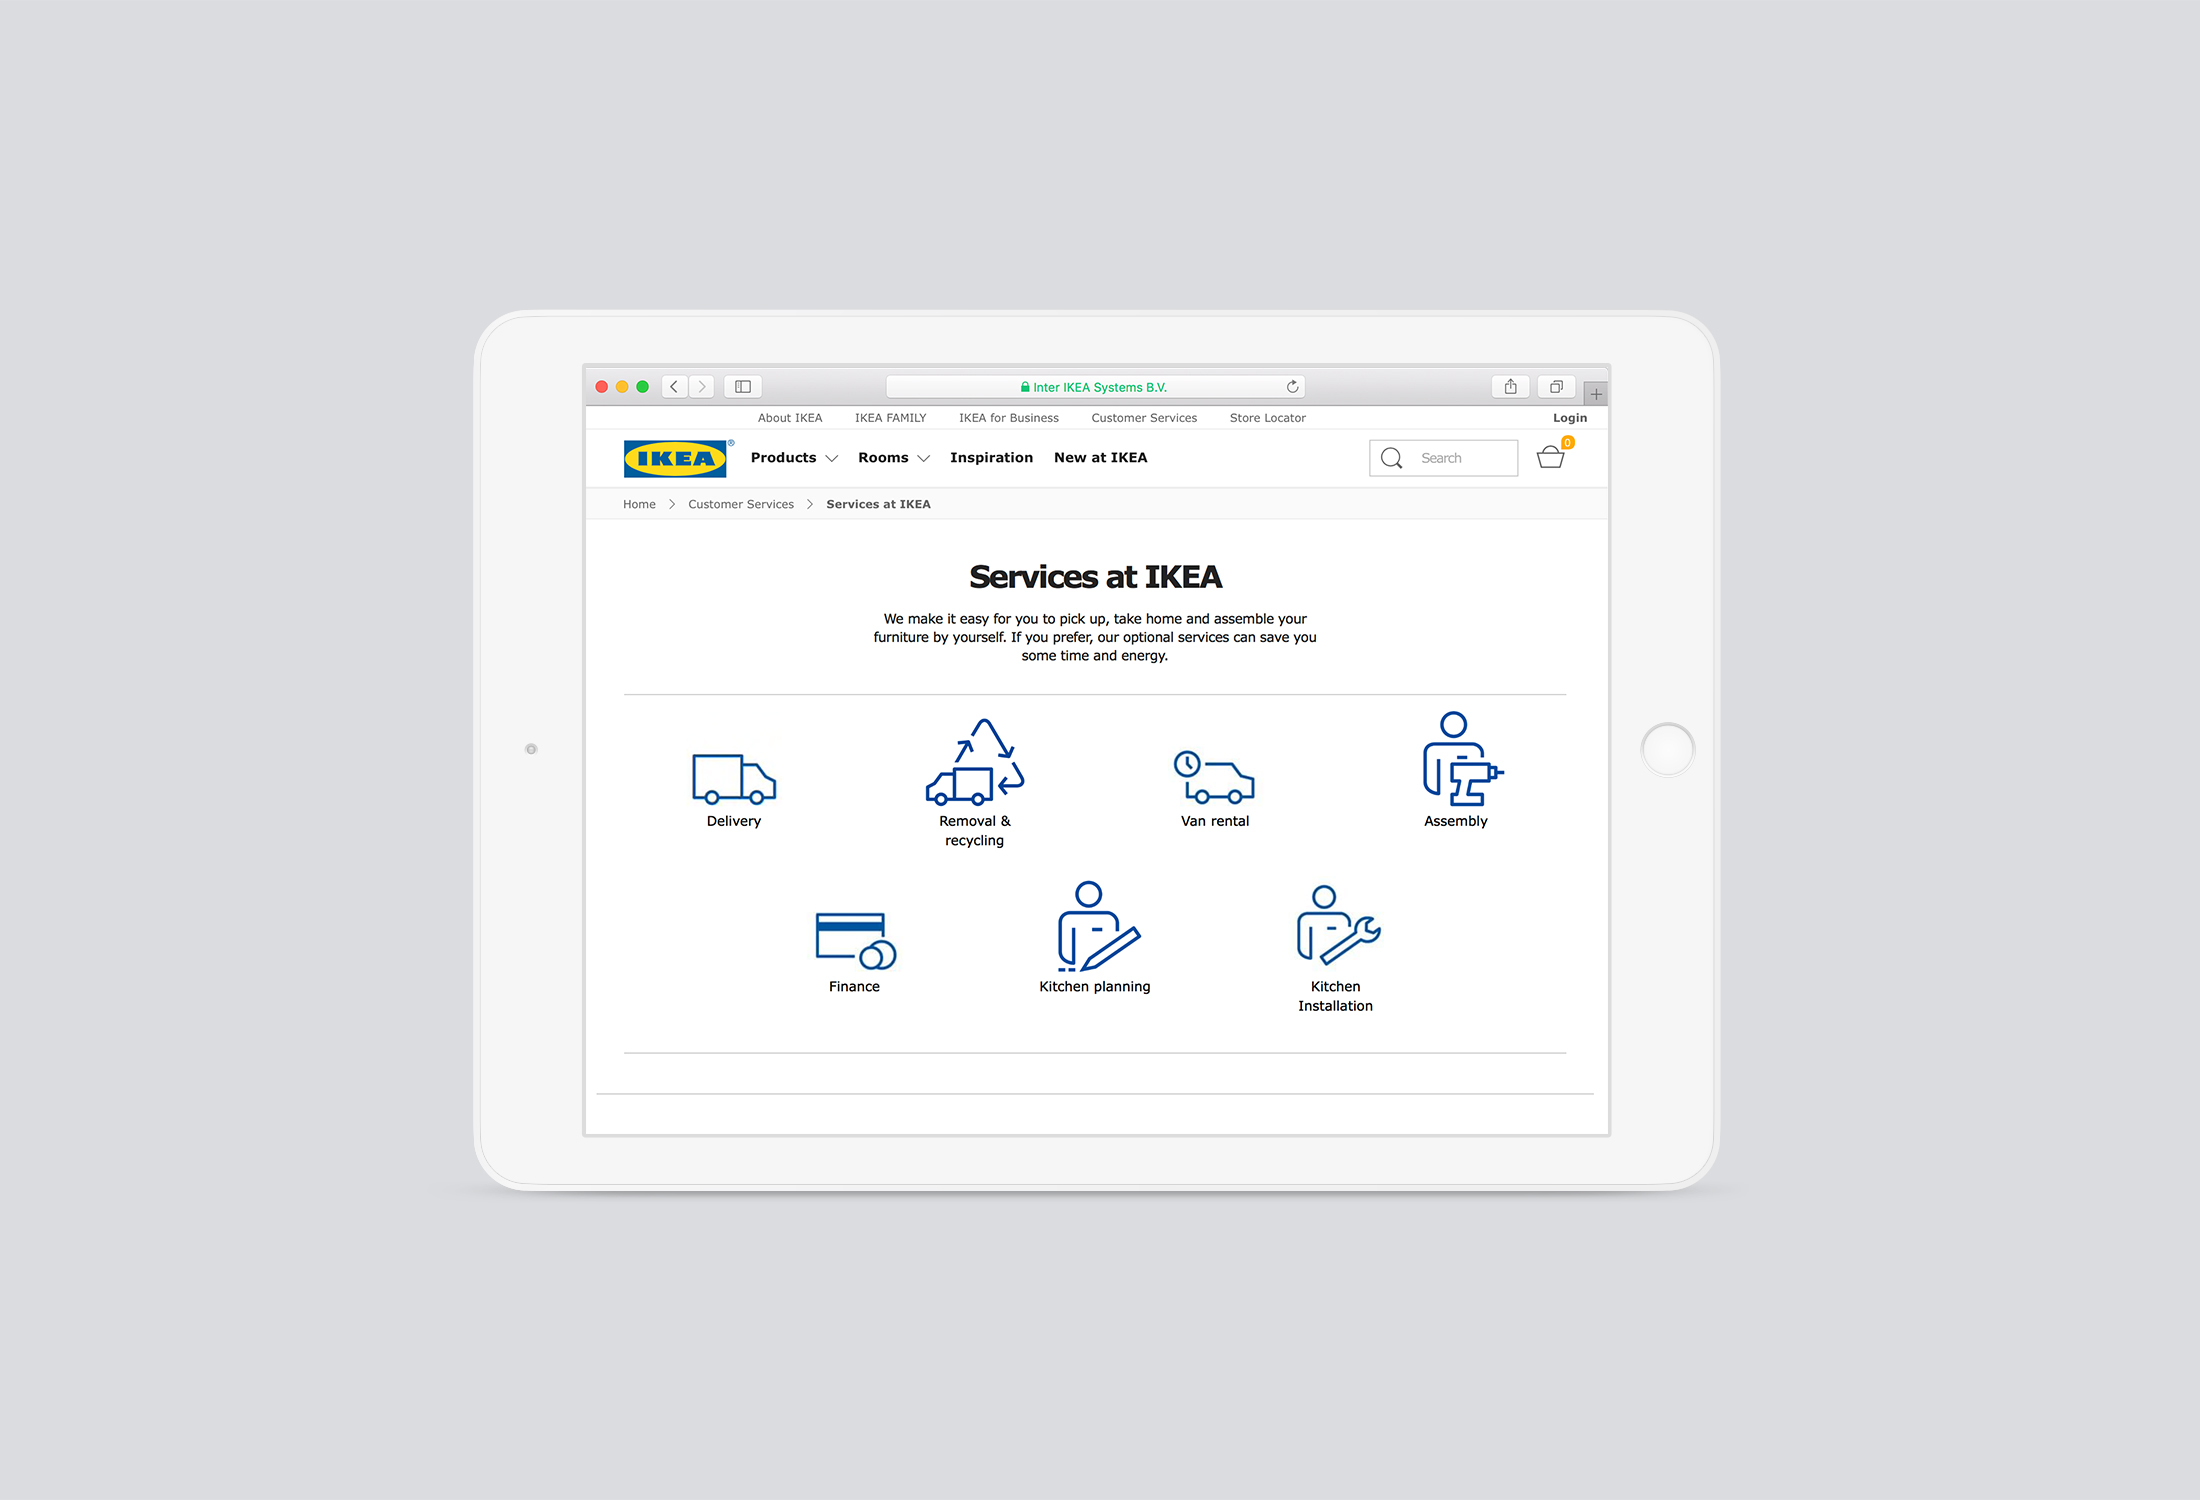 _IKEA_services+online.jpg